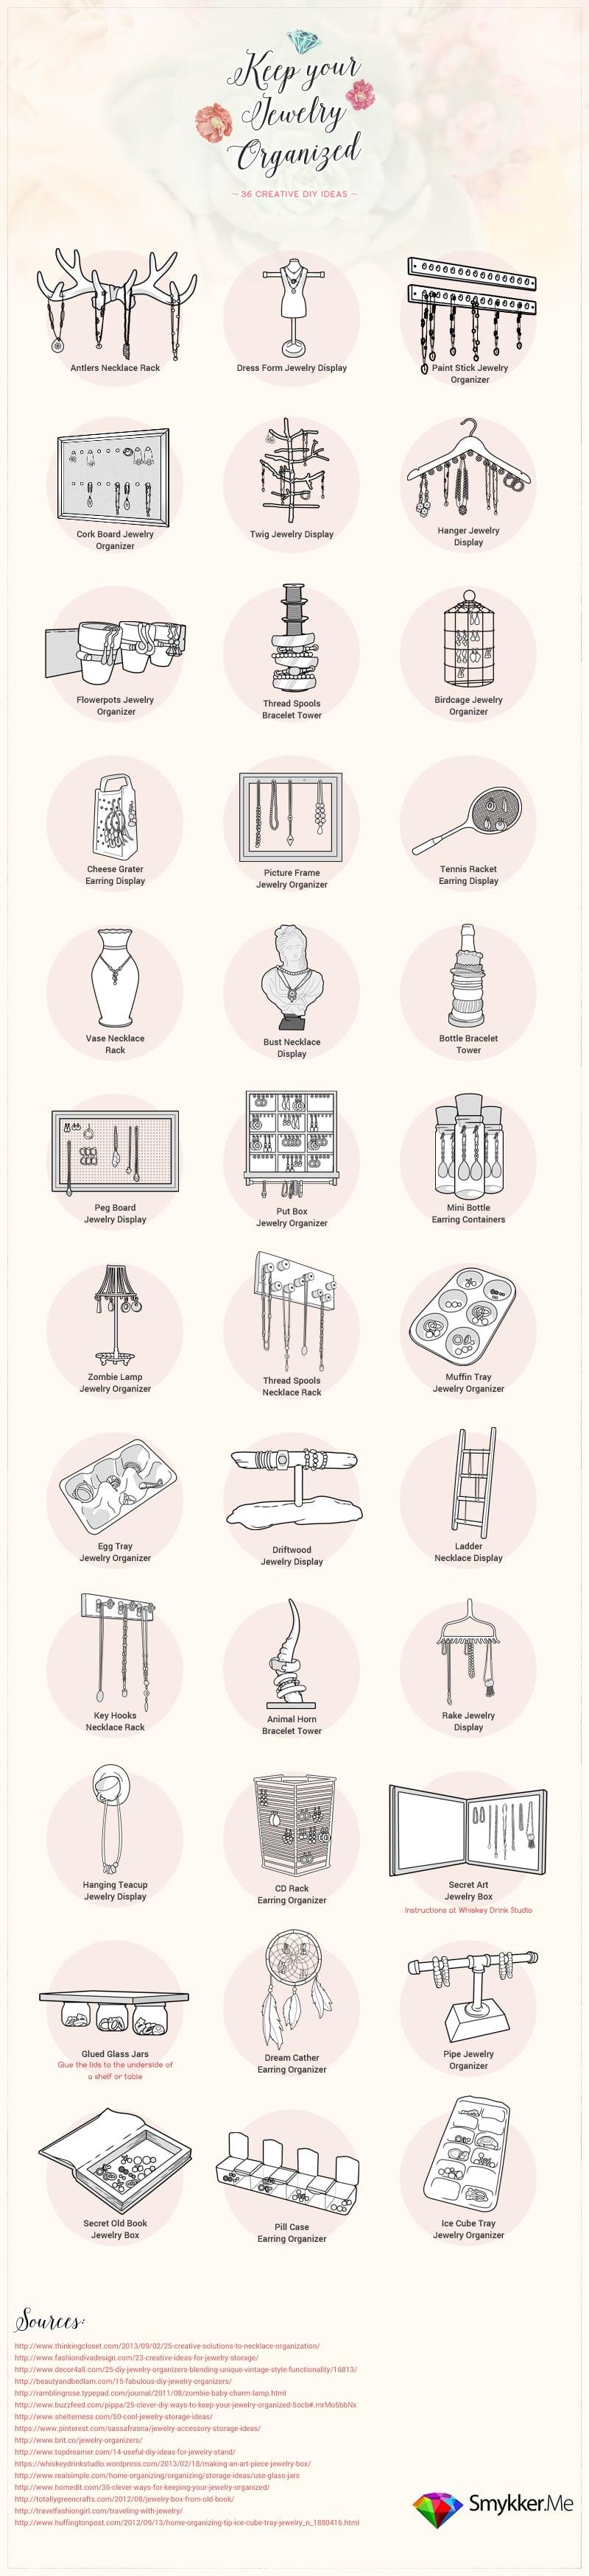 jewellery-organizing